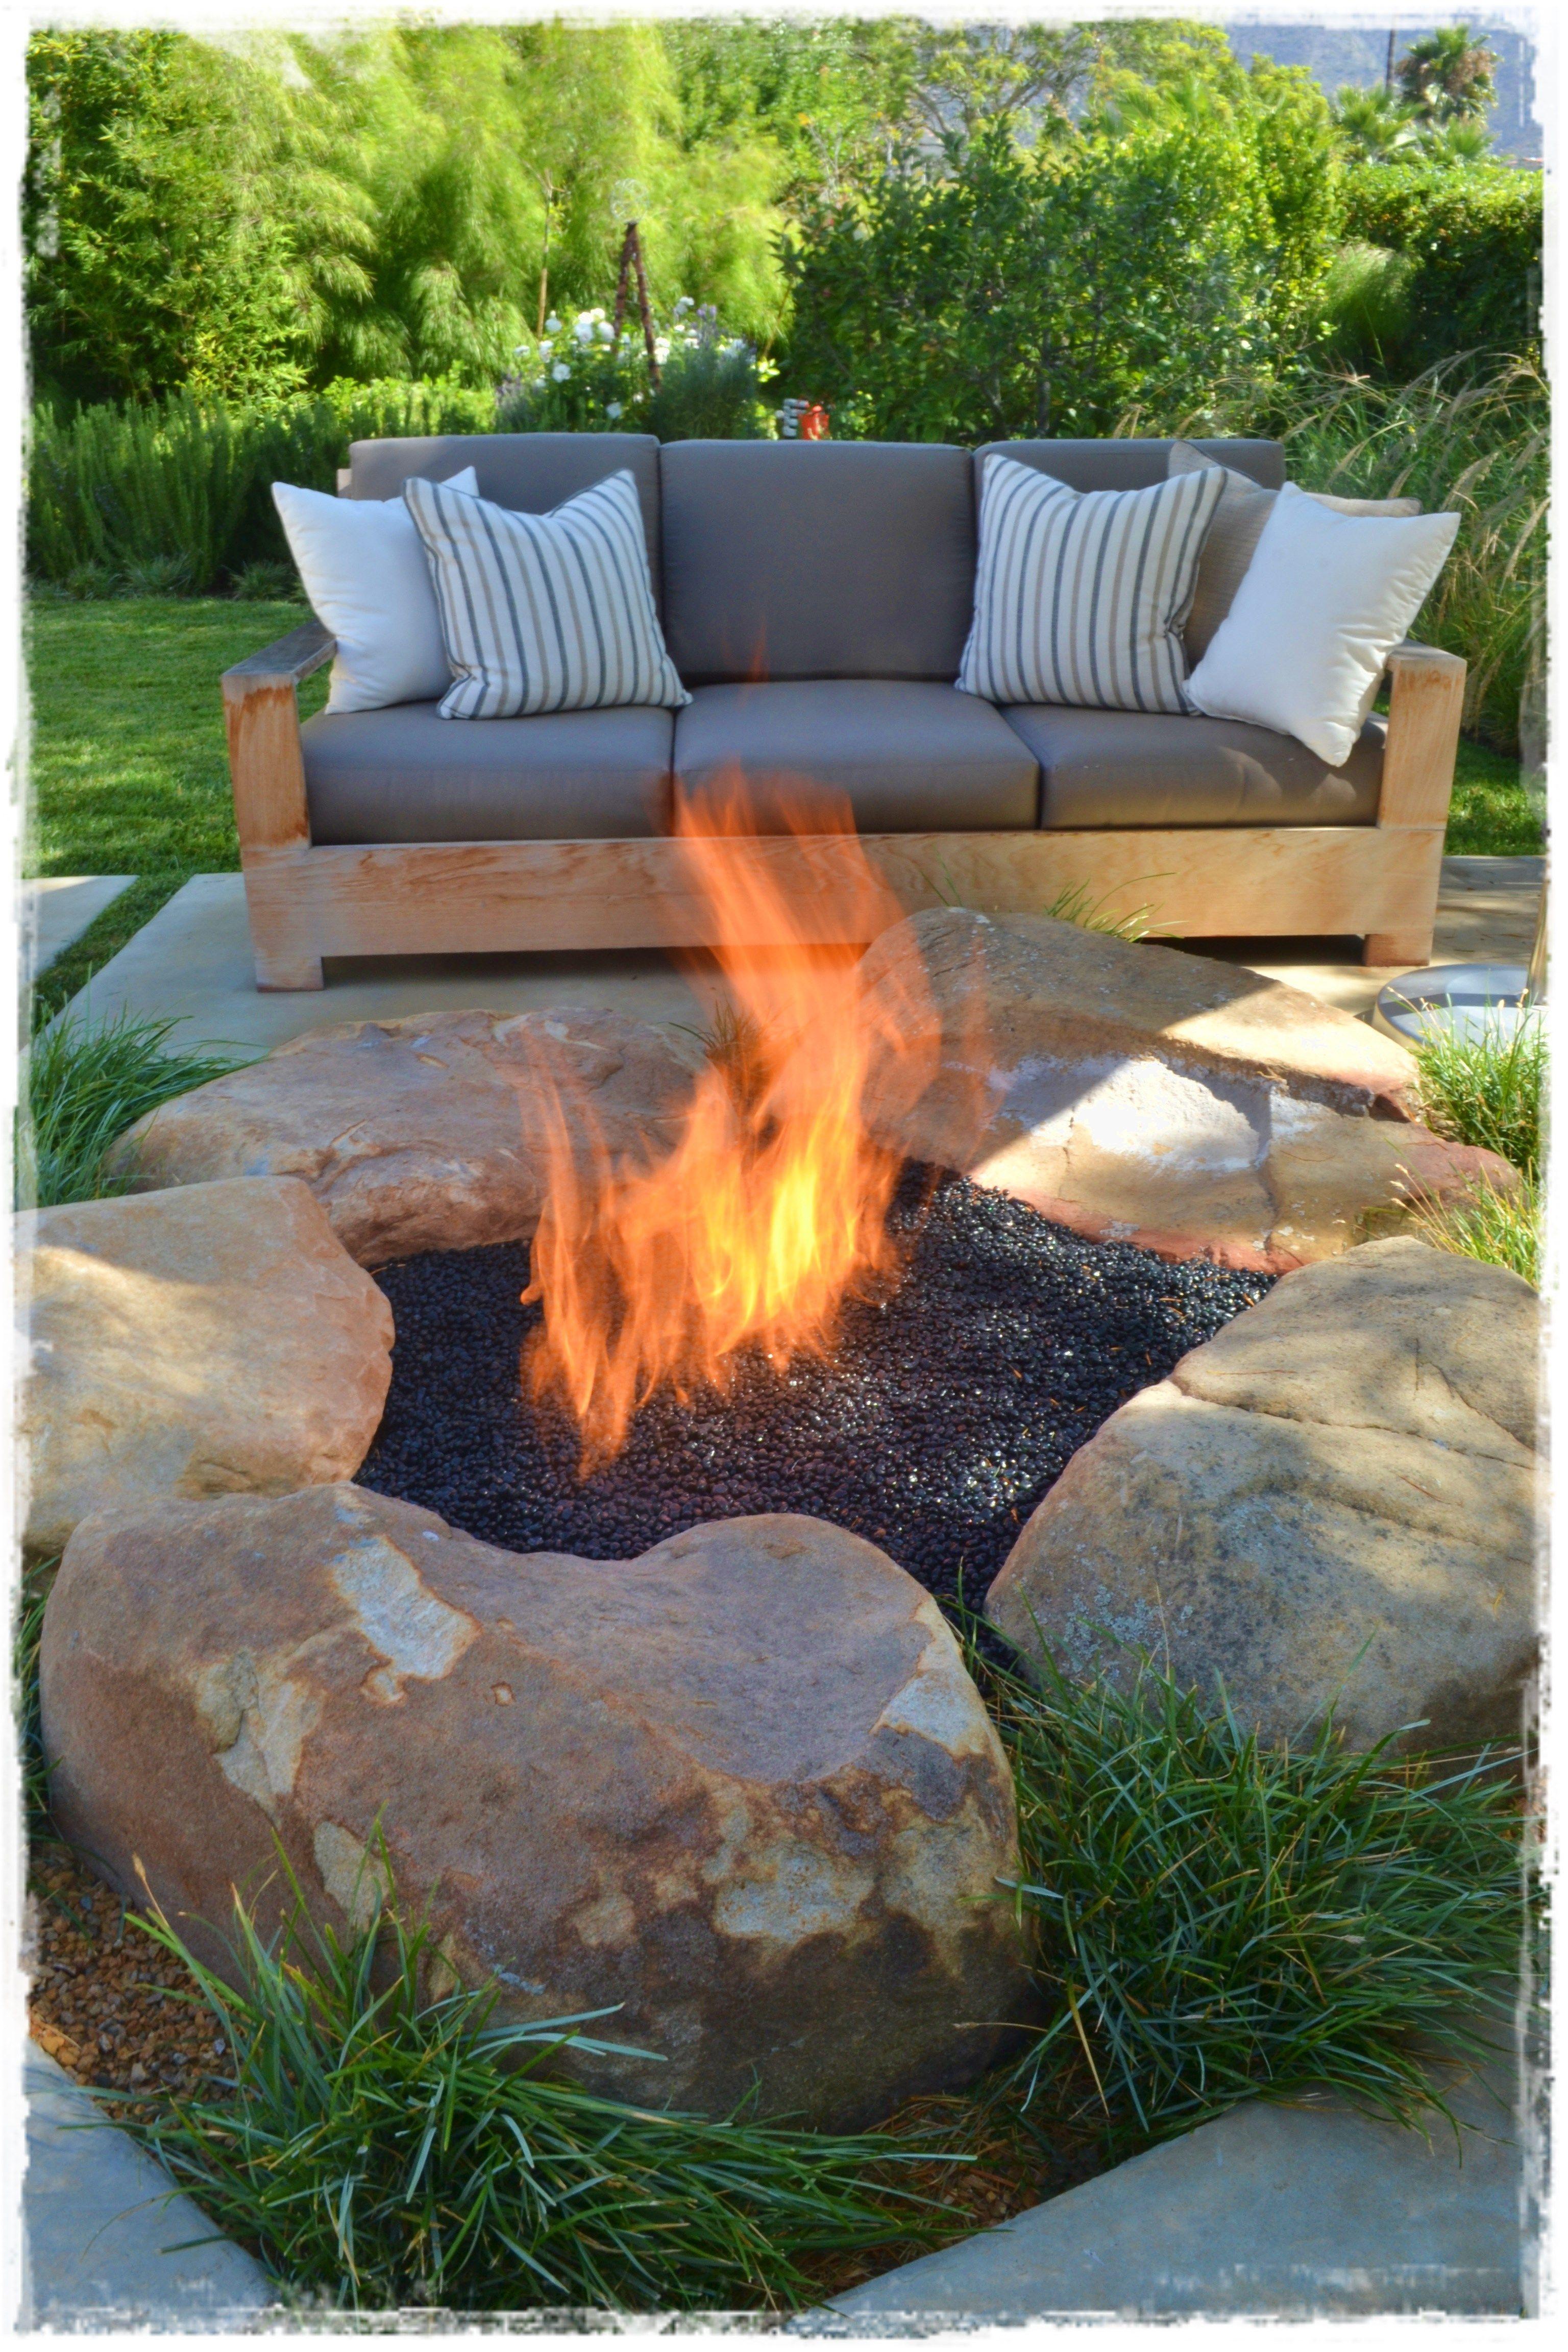 Pin by Kay Burton on Fireplaces   Backyard fire, Backyard ...